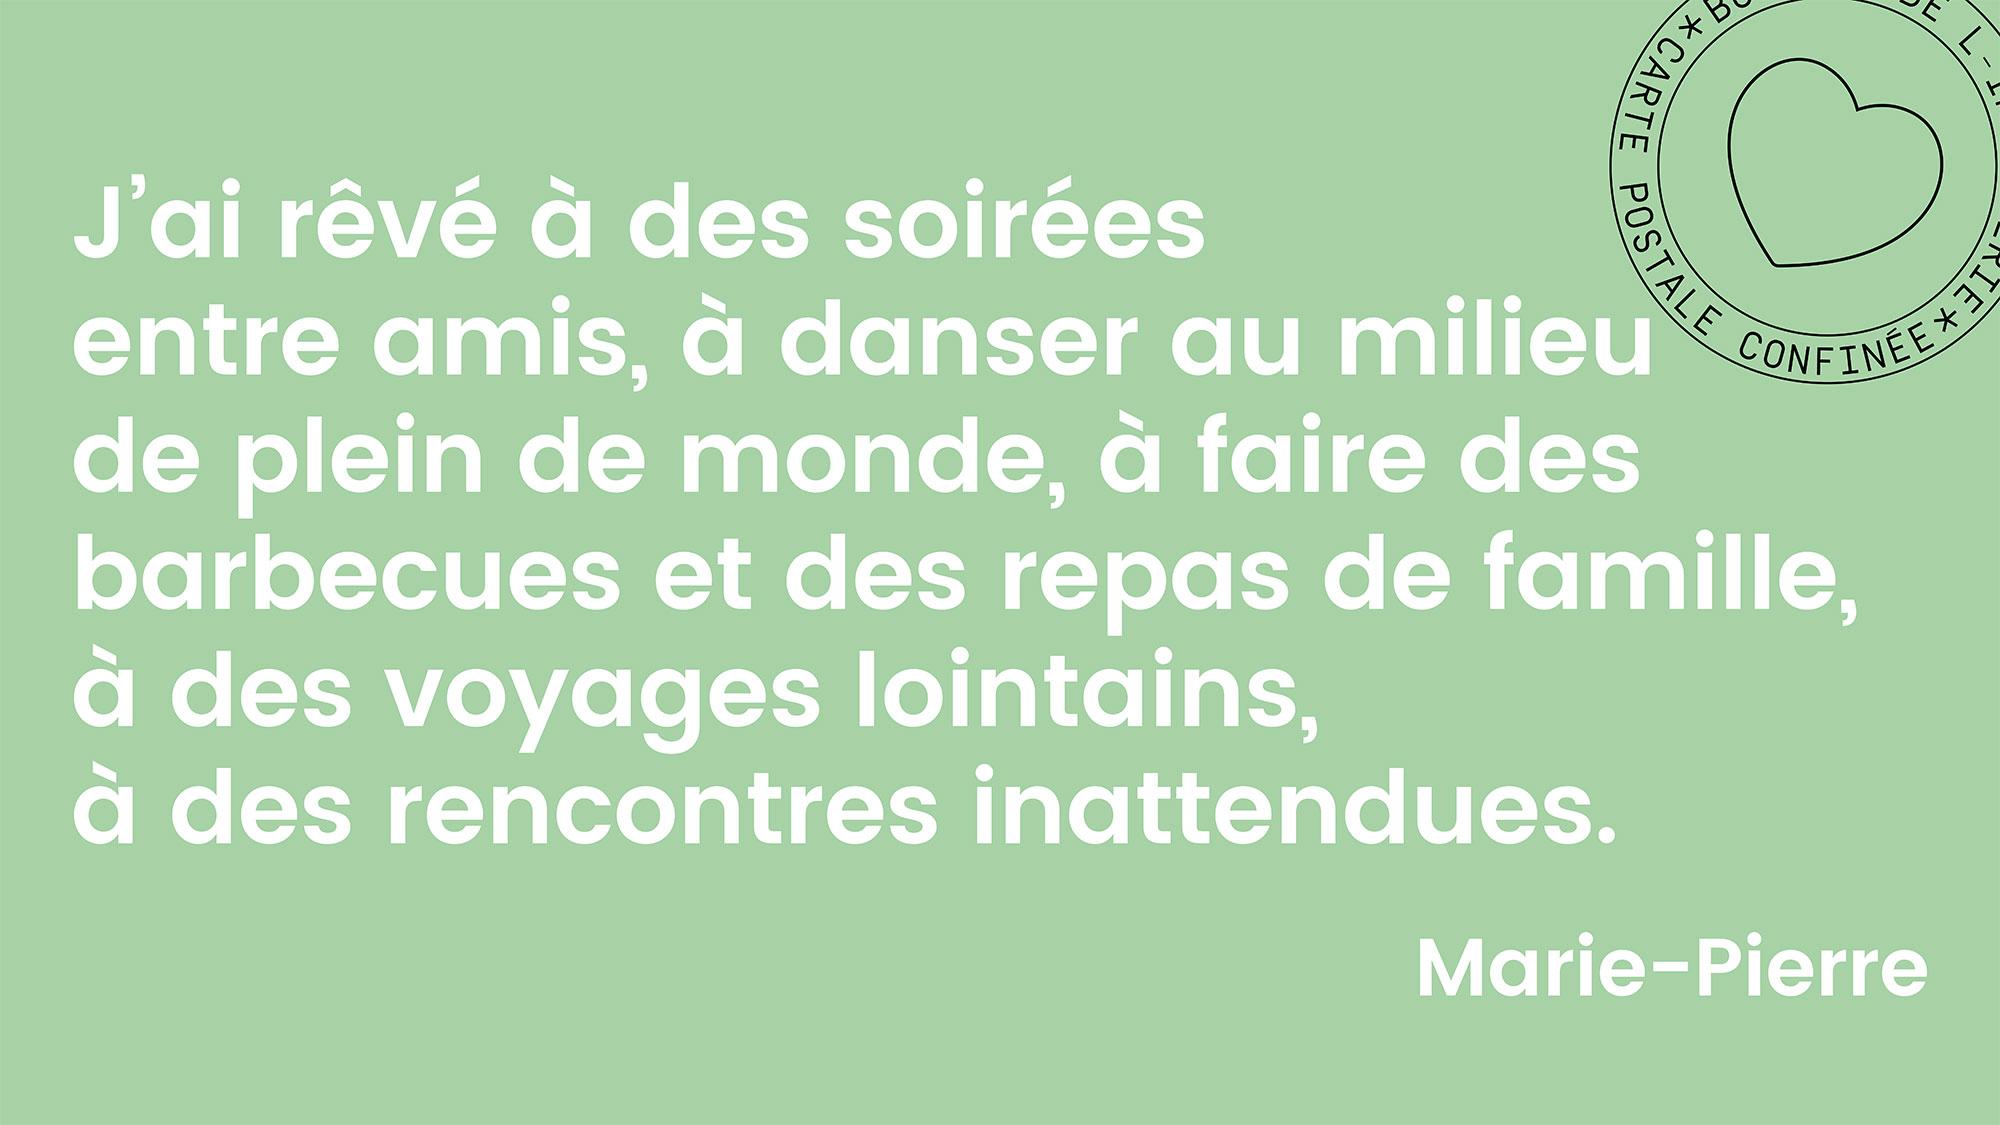 Carte postale confinée – Marie-Pierre Cravedi